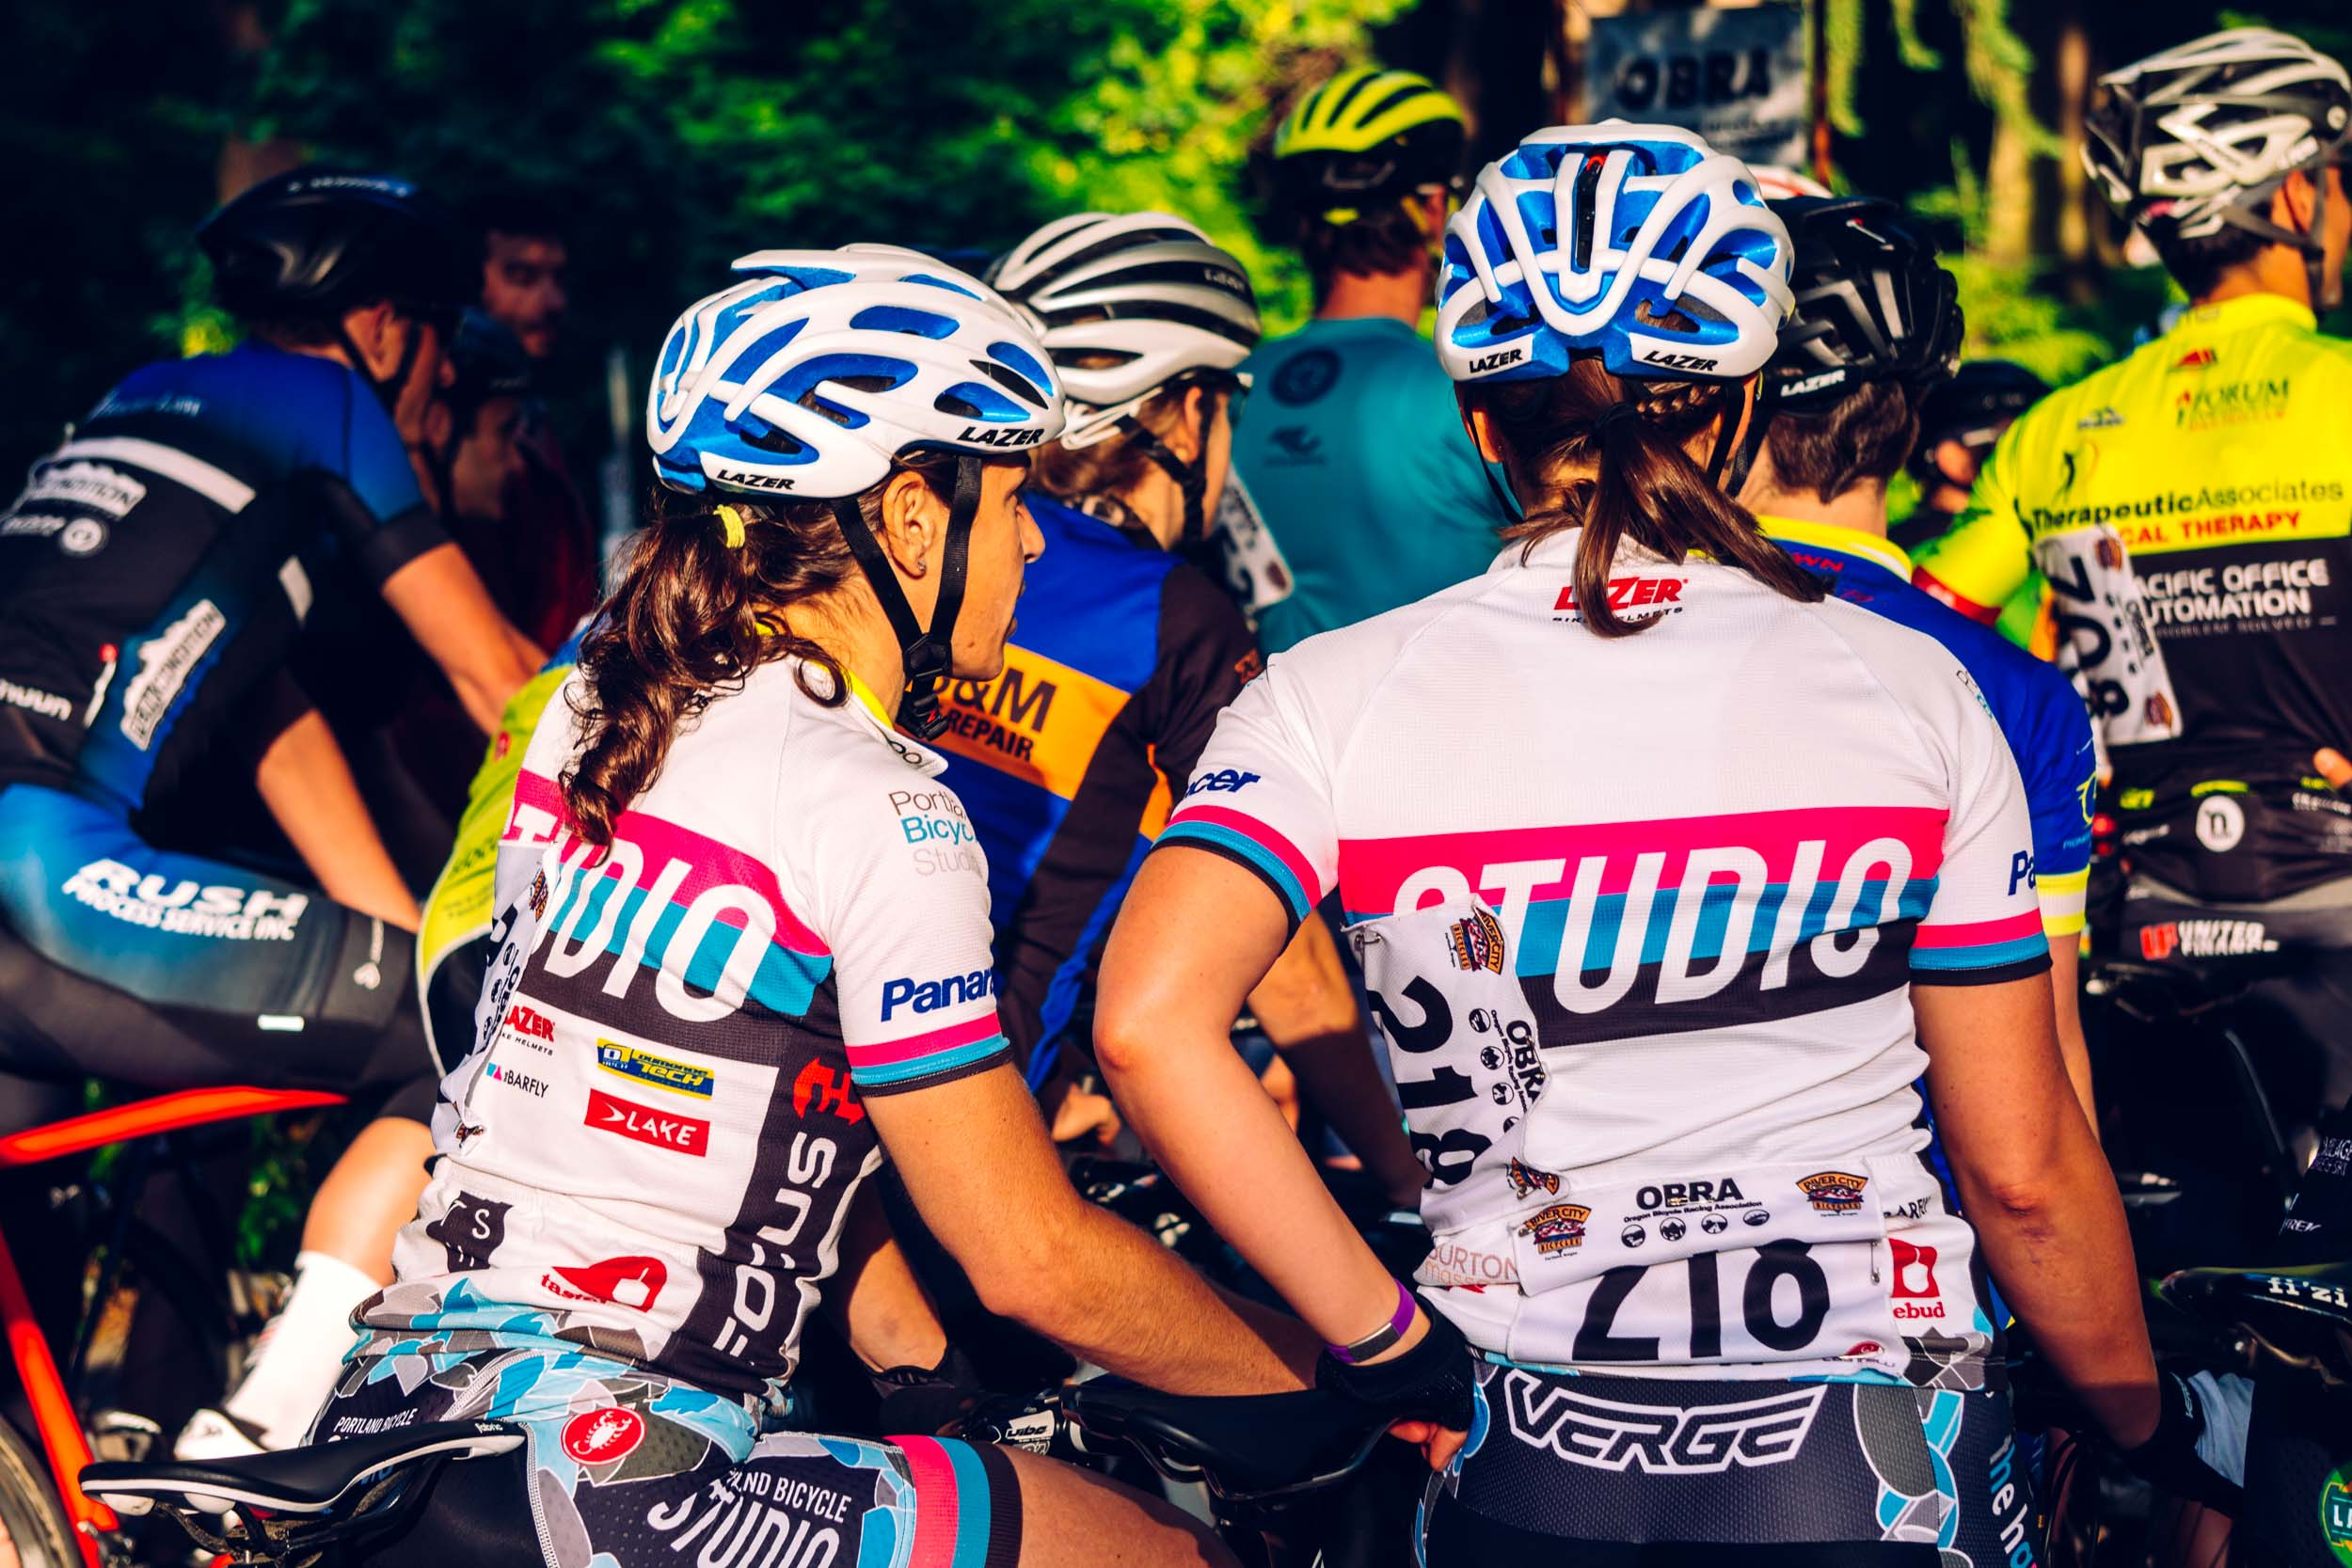 tabor_road_race_2_15.jpg